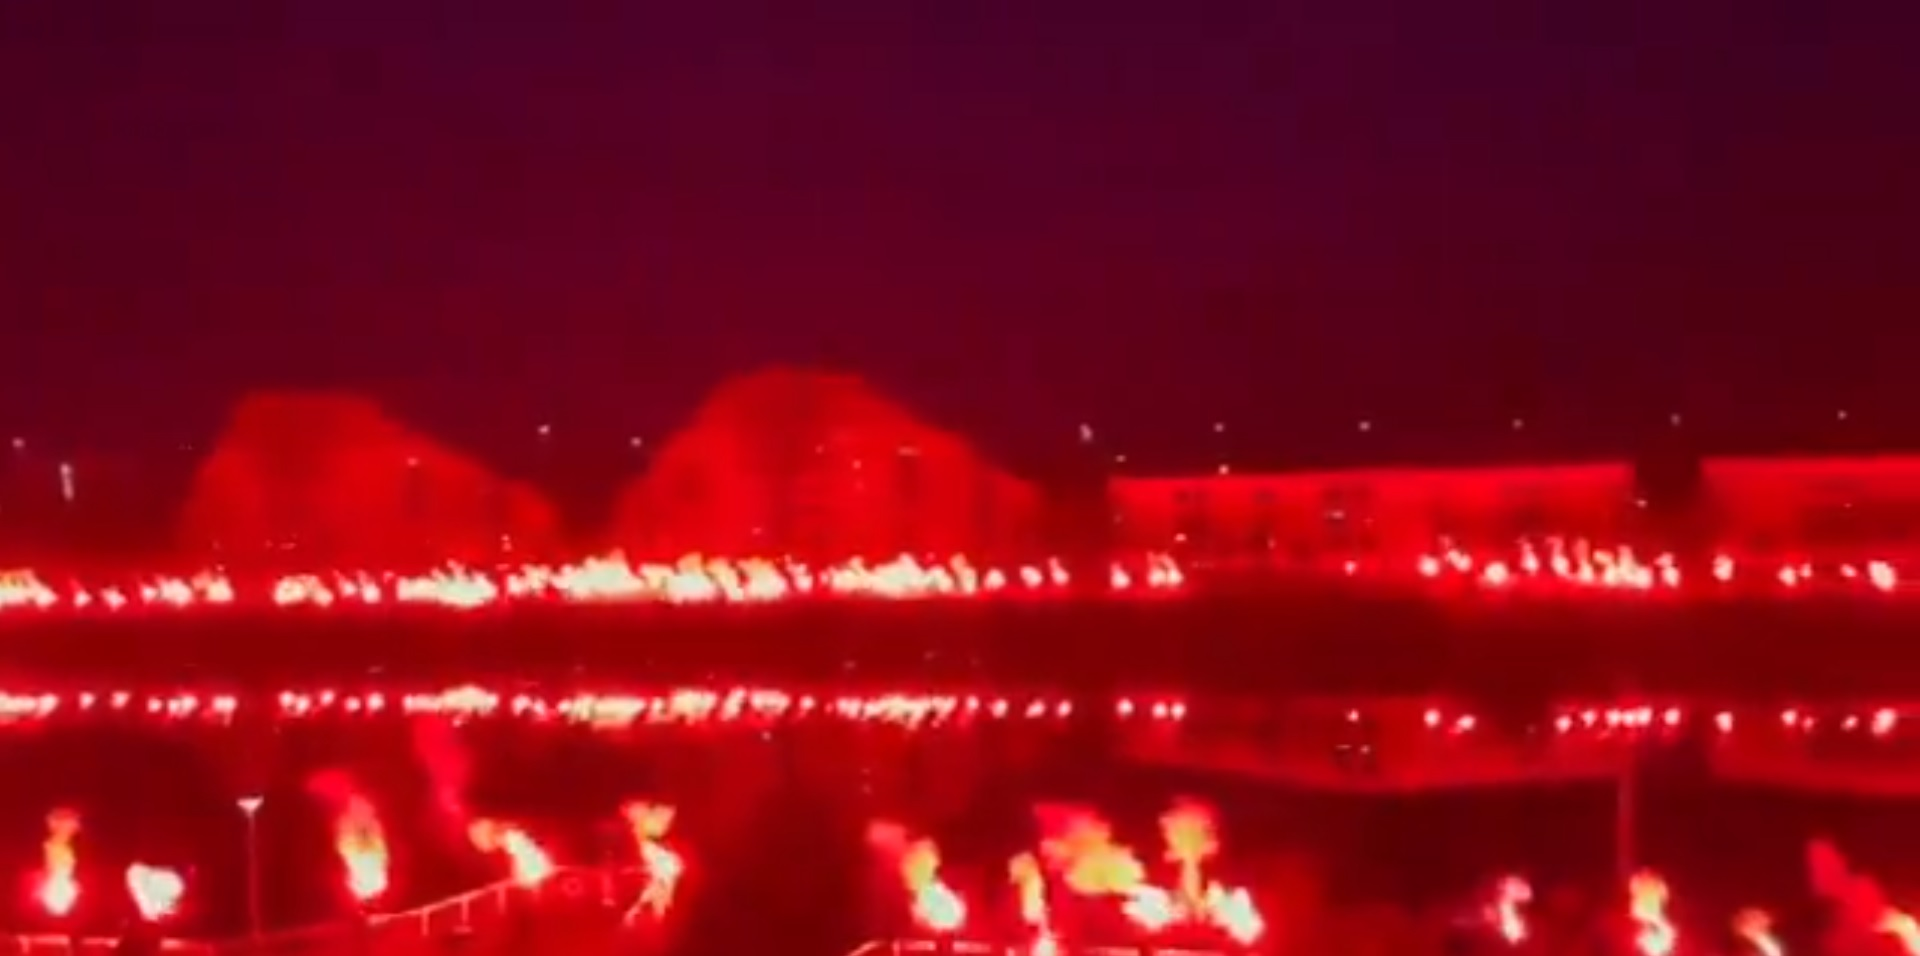 (Video) Fans of Gerrard's Rangers turn Glasgow red in title celebrations